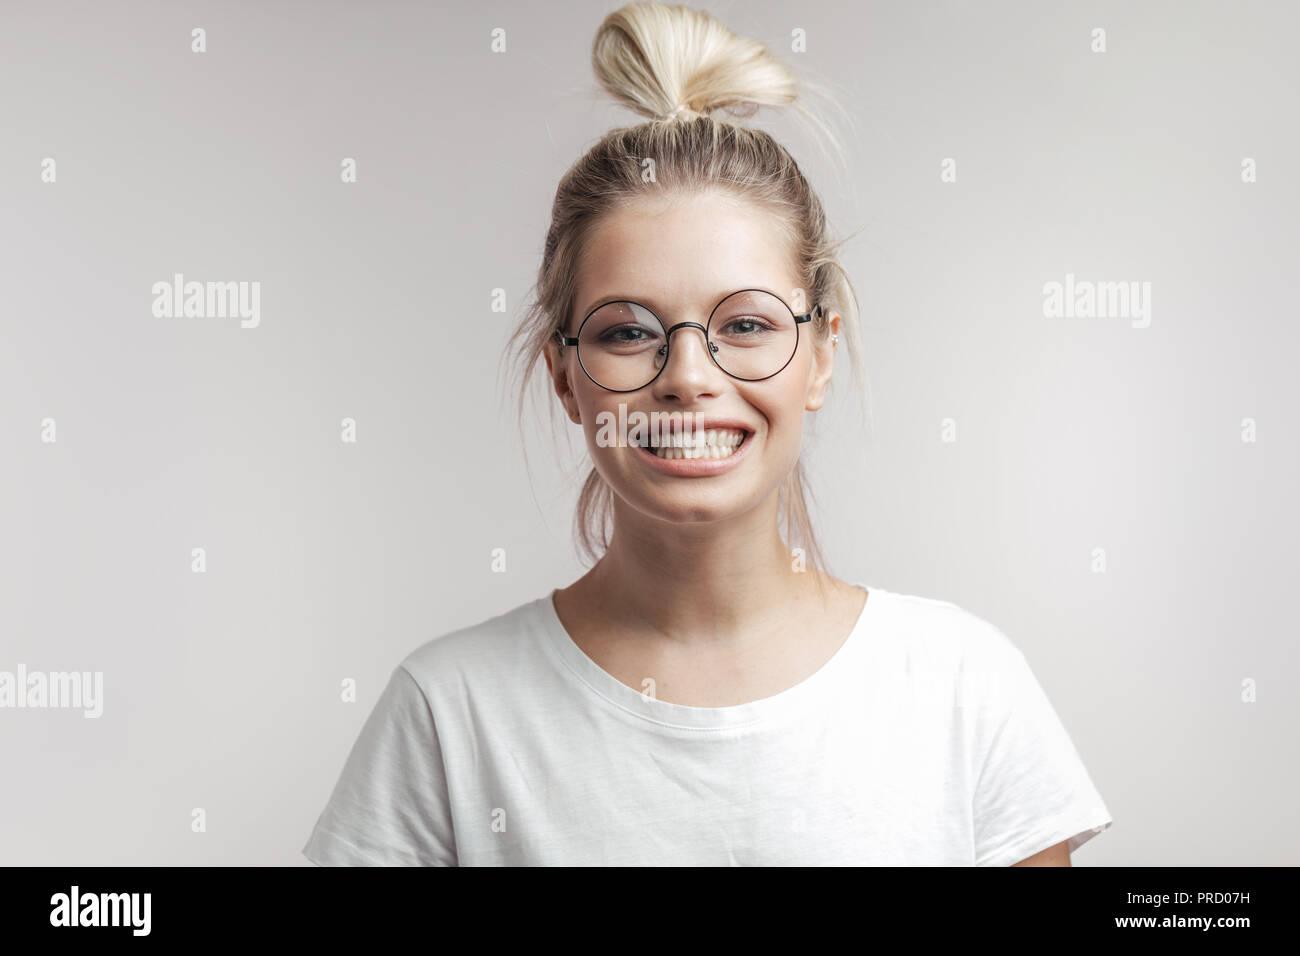 Happy smiling woman with Blonde hair bun pose seul contre fond blanc. Photo Stock